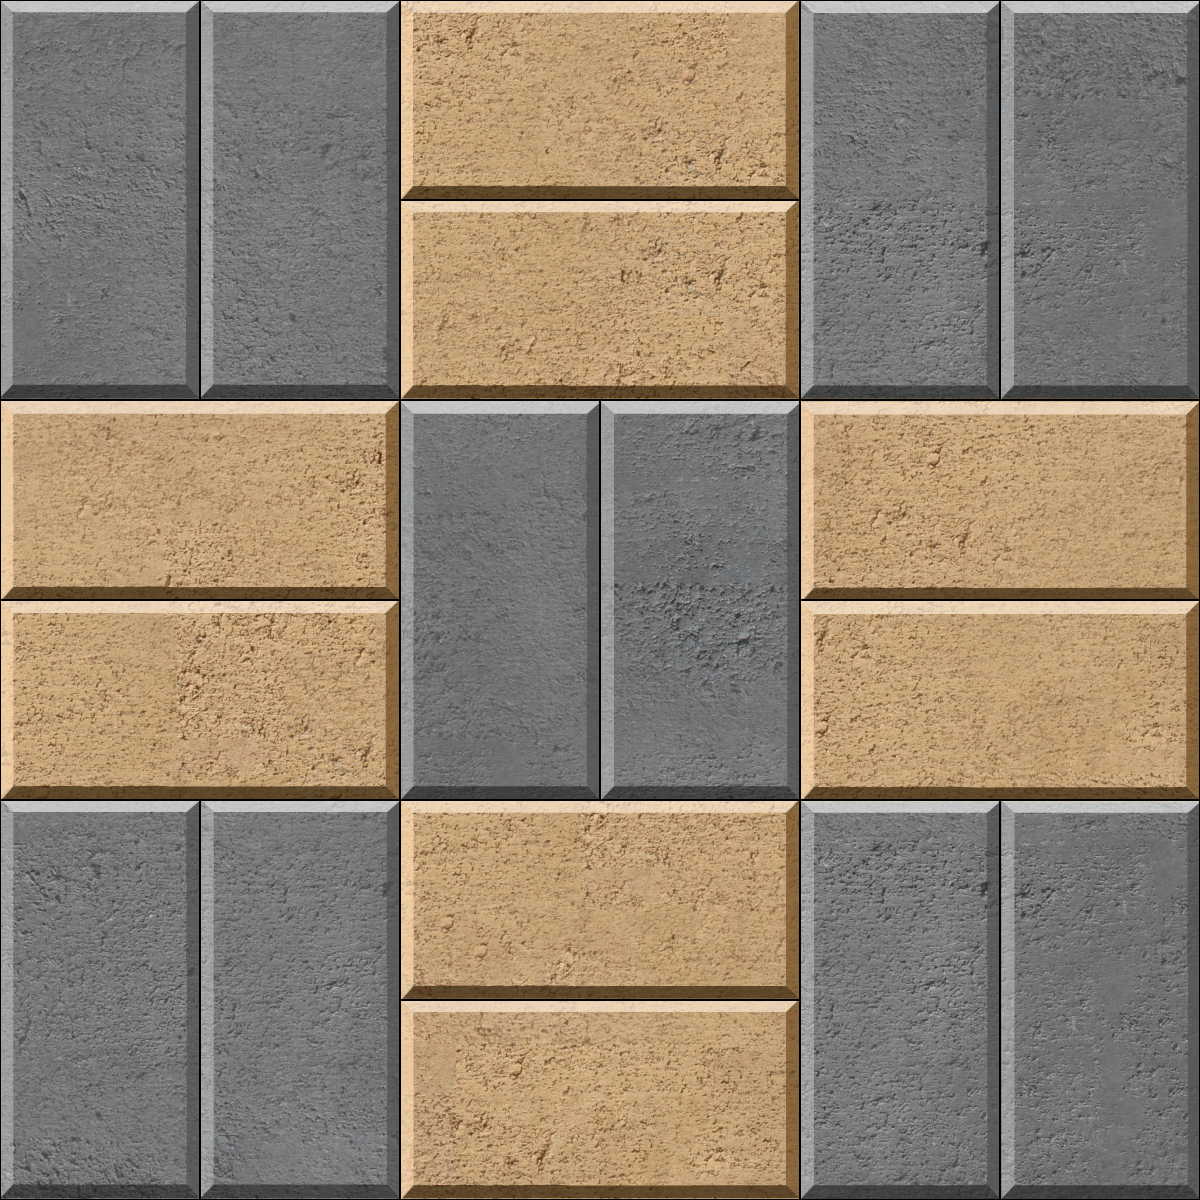 Basketweave Contrast brick paver